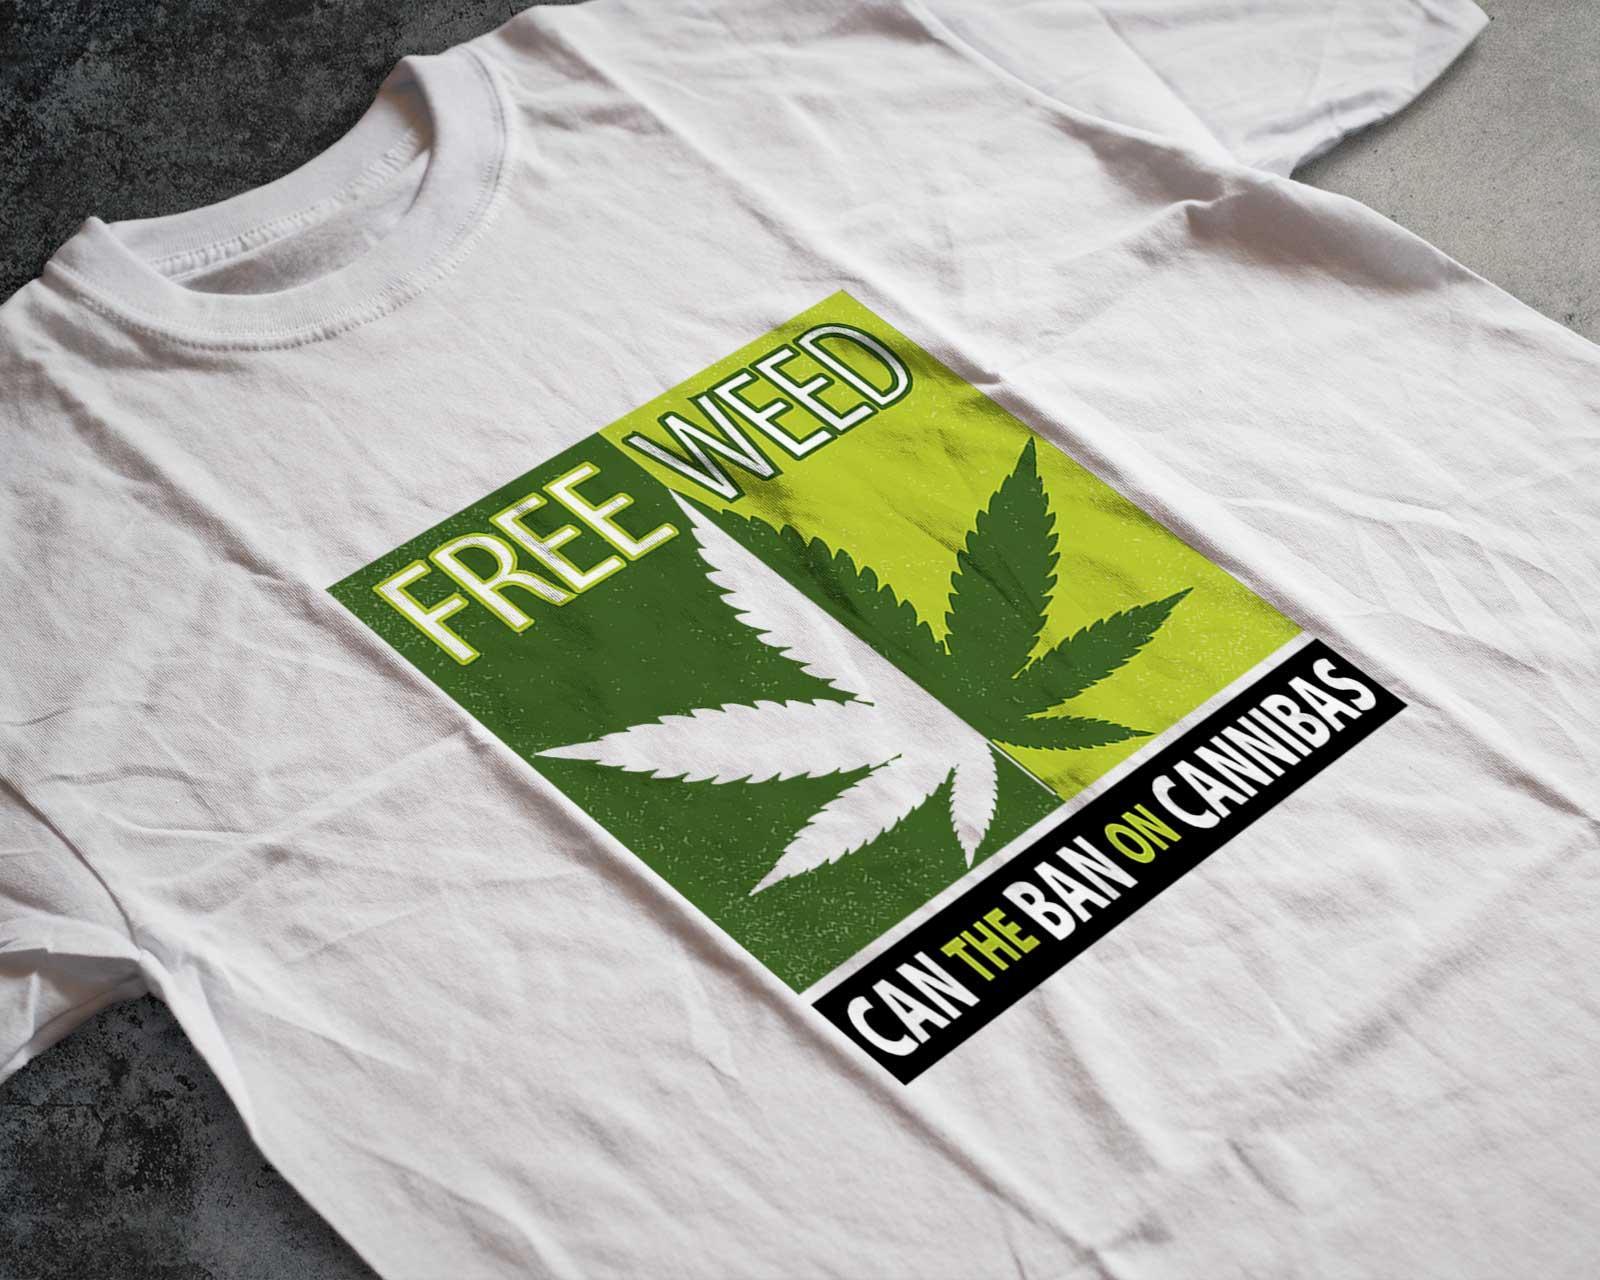 Political Campaign T-Shirt Design by Jennifer Lee